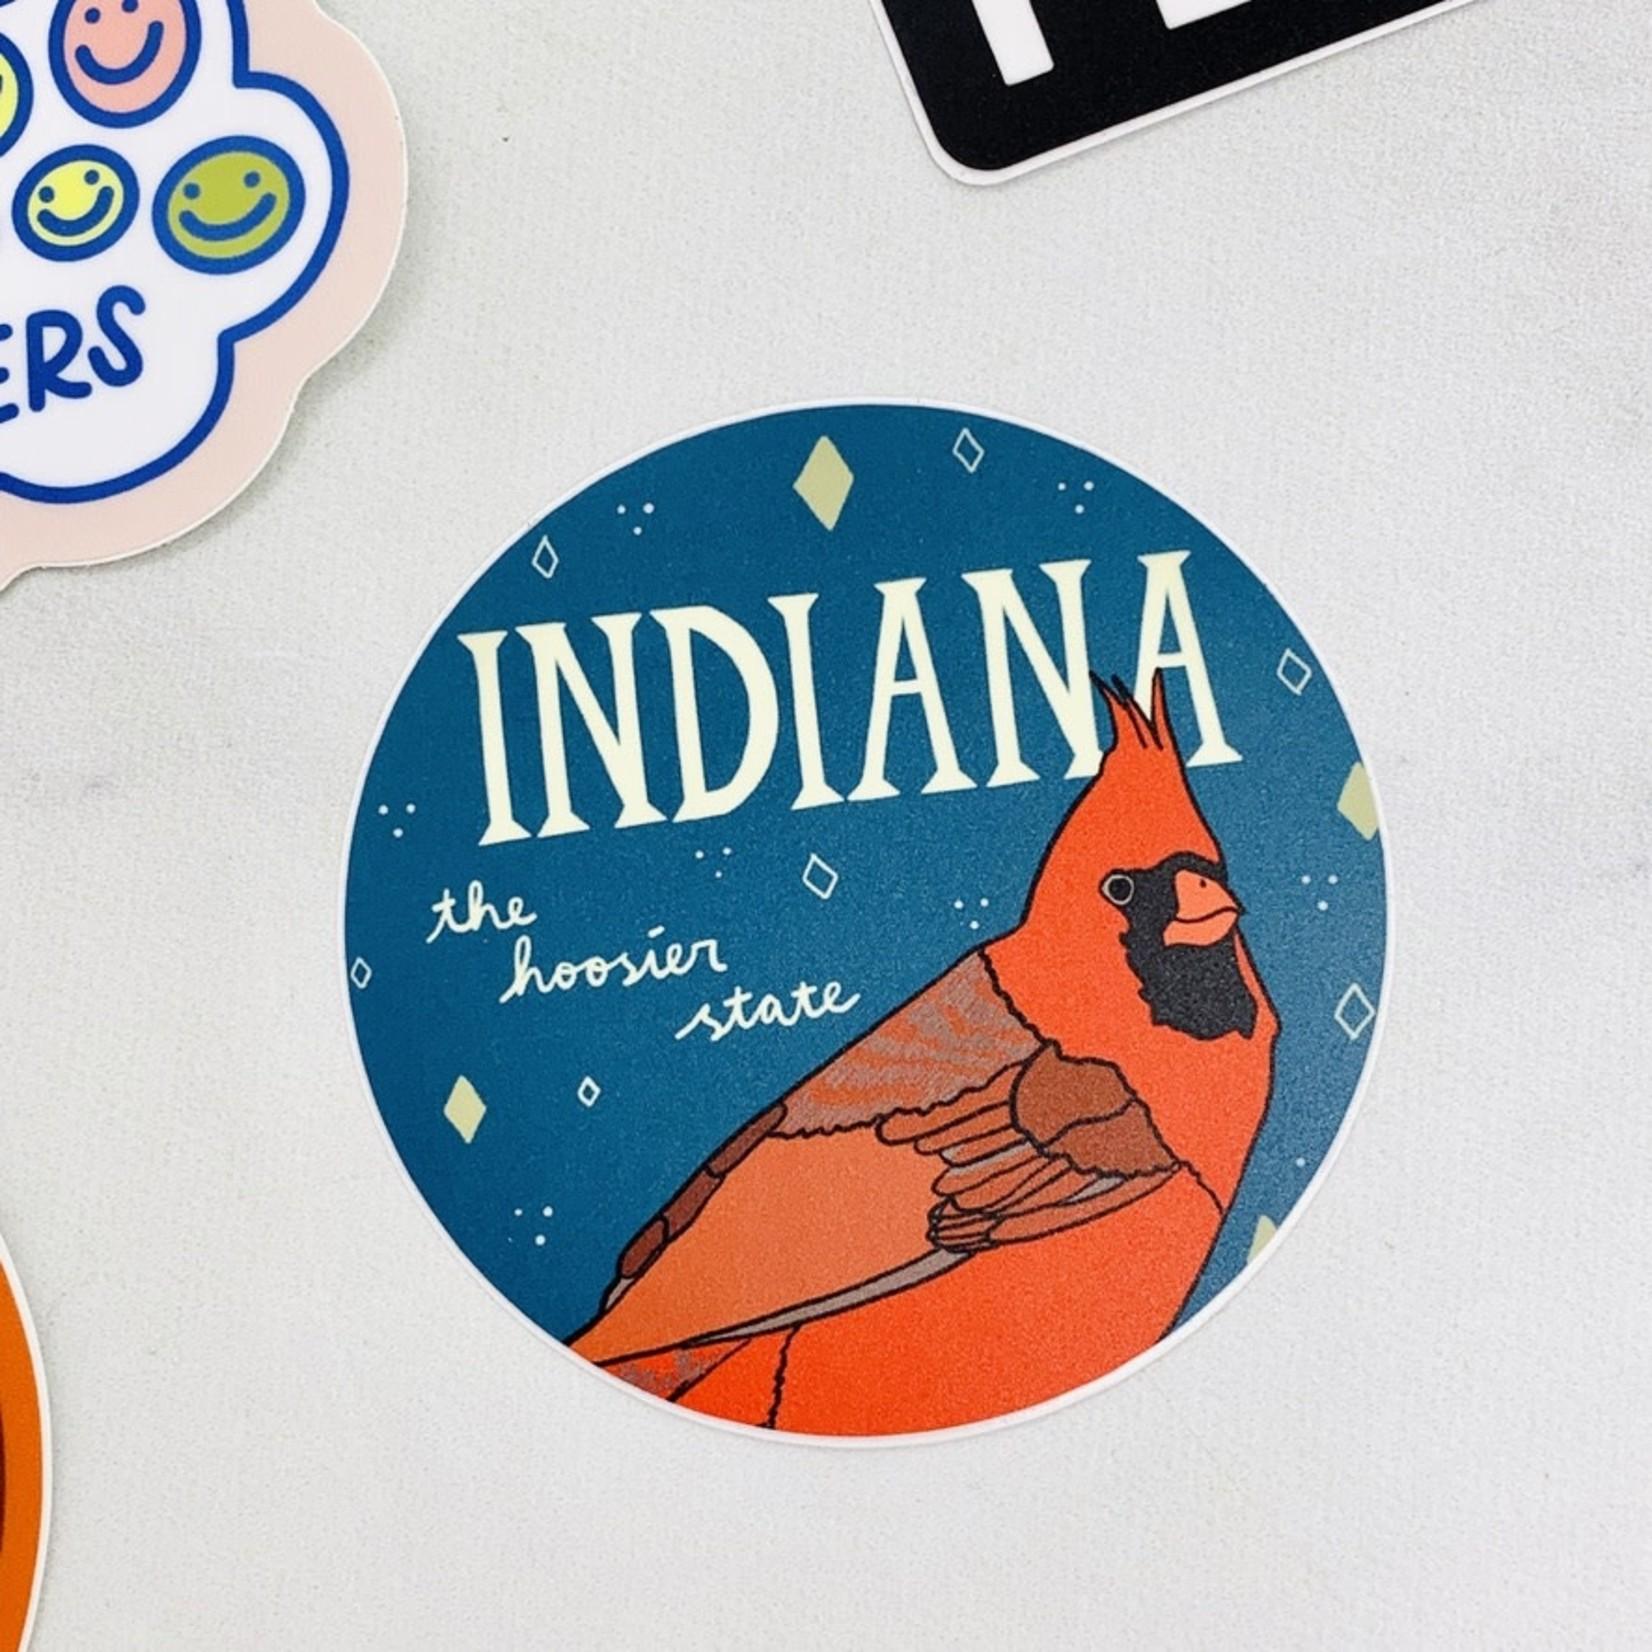 Made by Nilina Indiana Sticker Hoosier State Souvenir